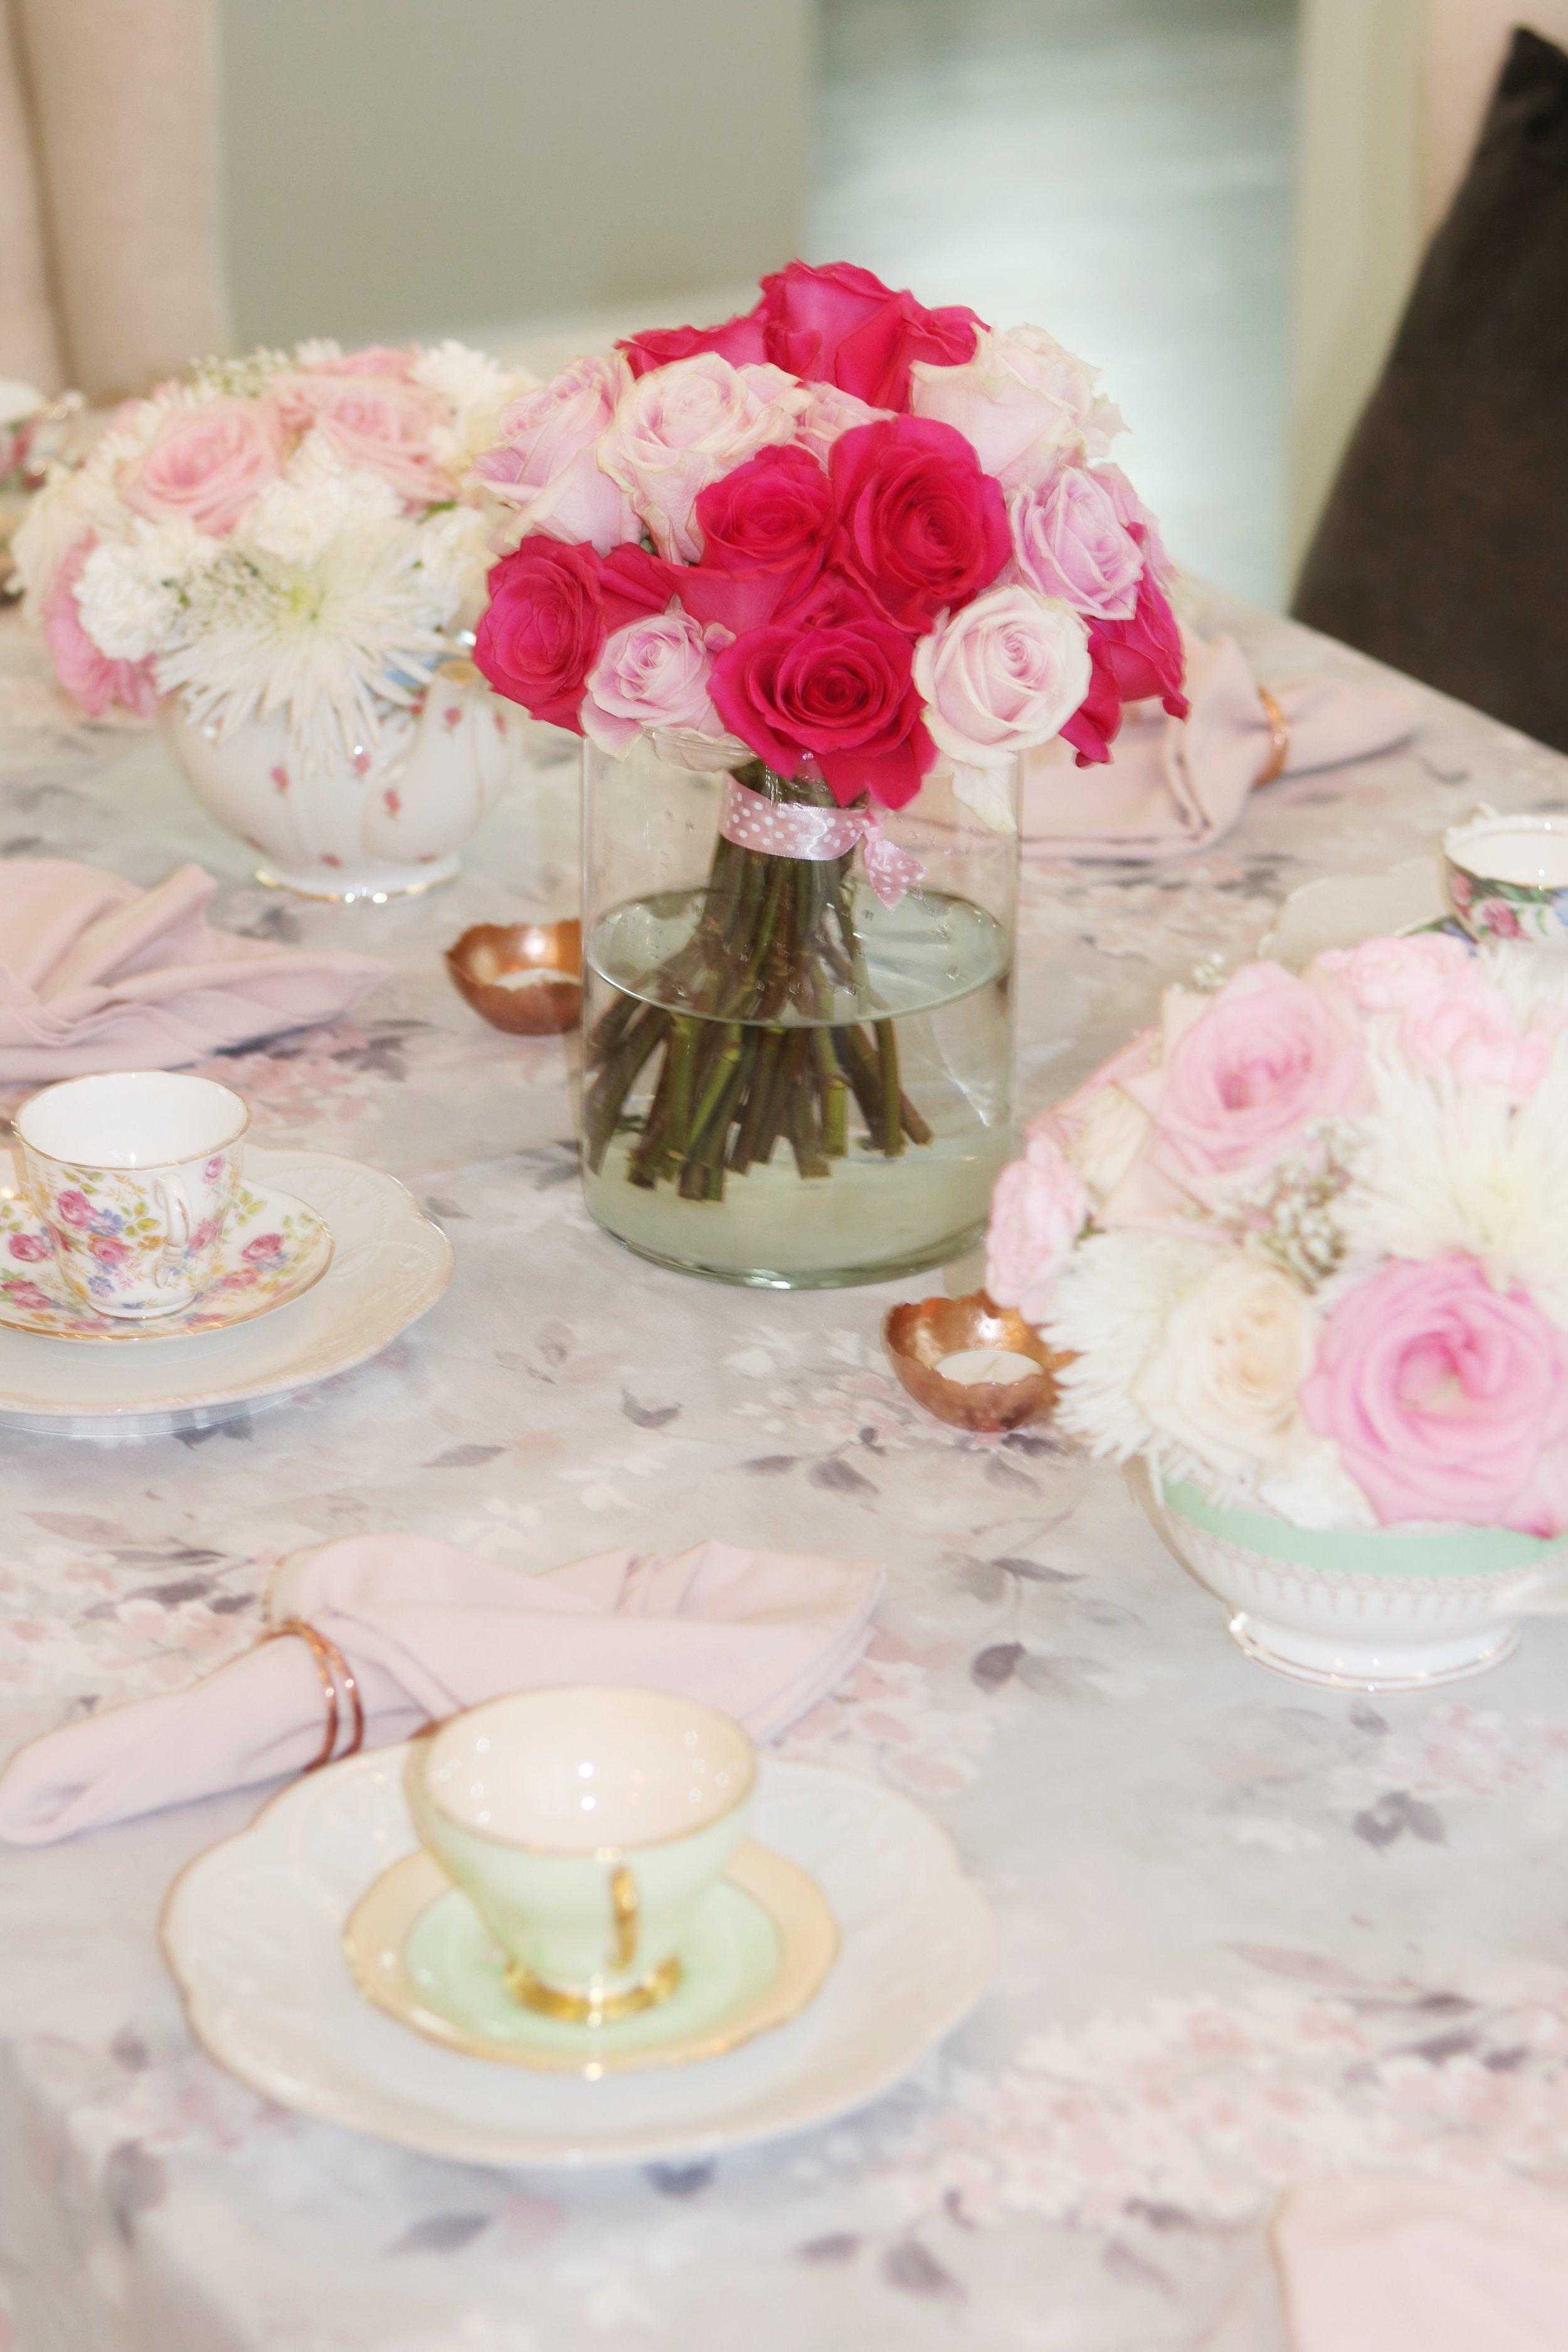 tea party vintage pots and tea sets.jpg